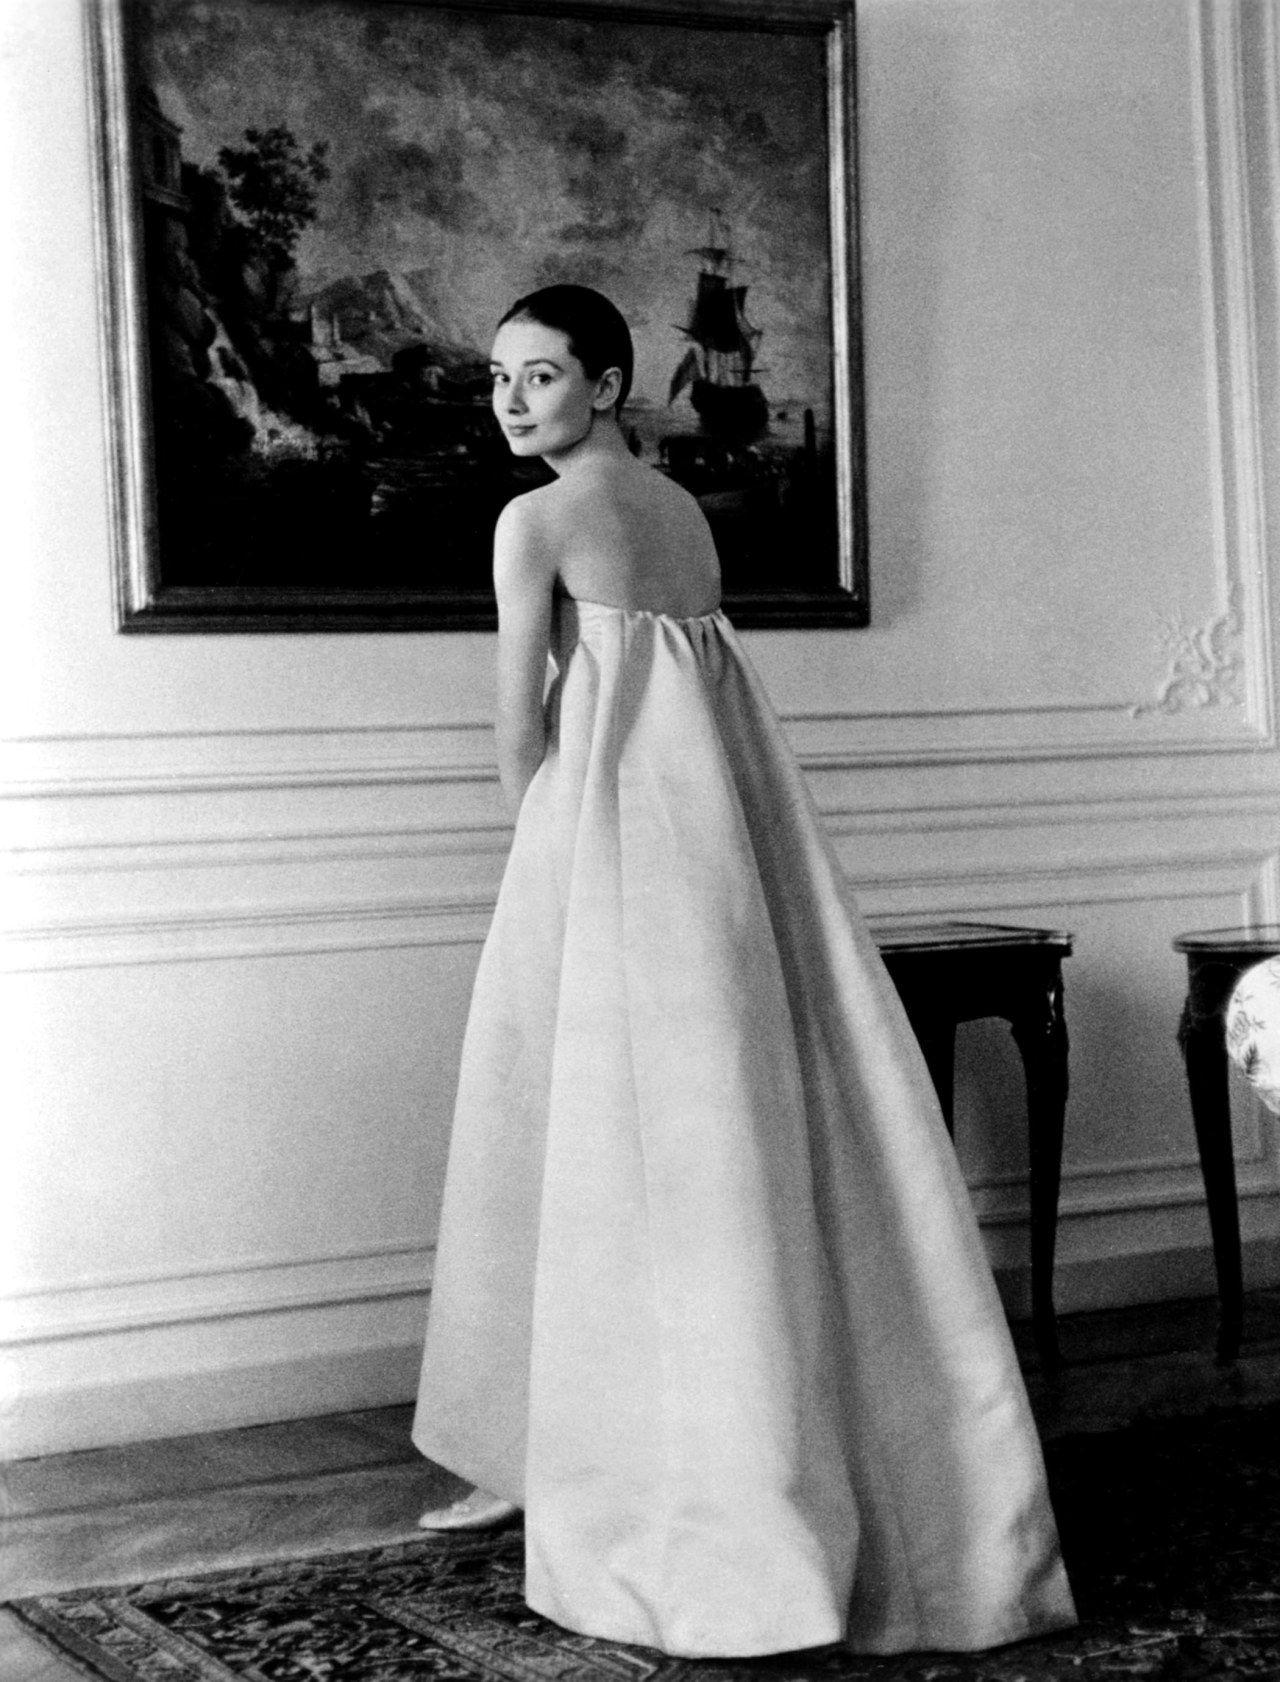 Givenchy dress, Audrey hepburn style ...